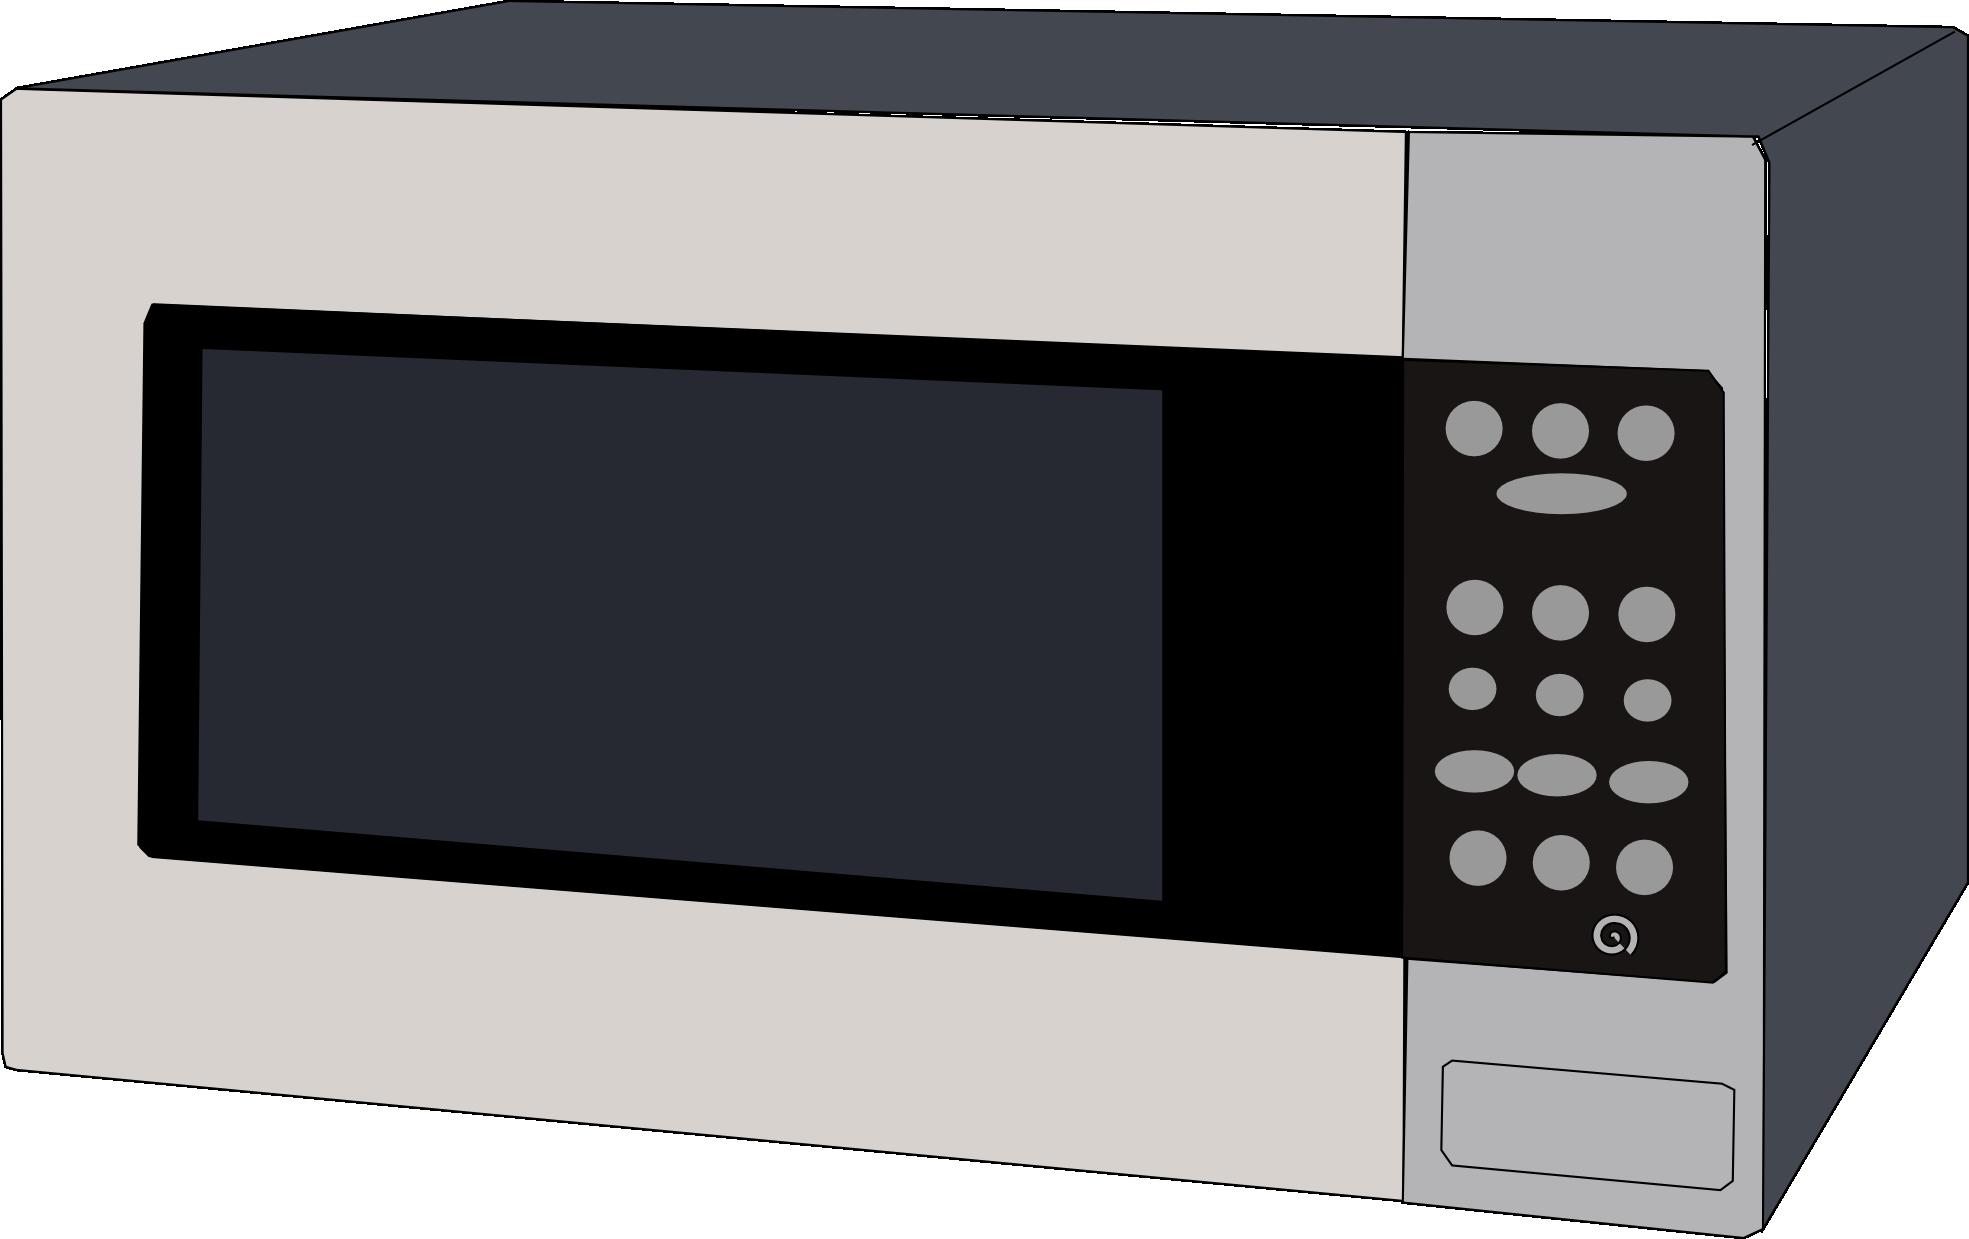 Microwave clip art